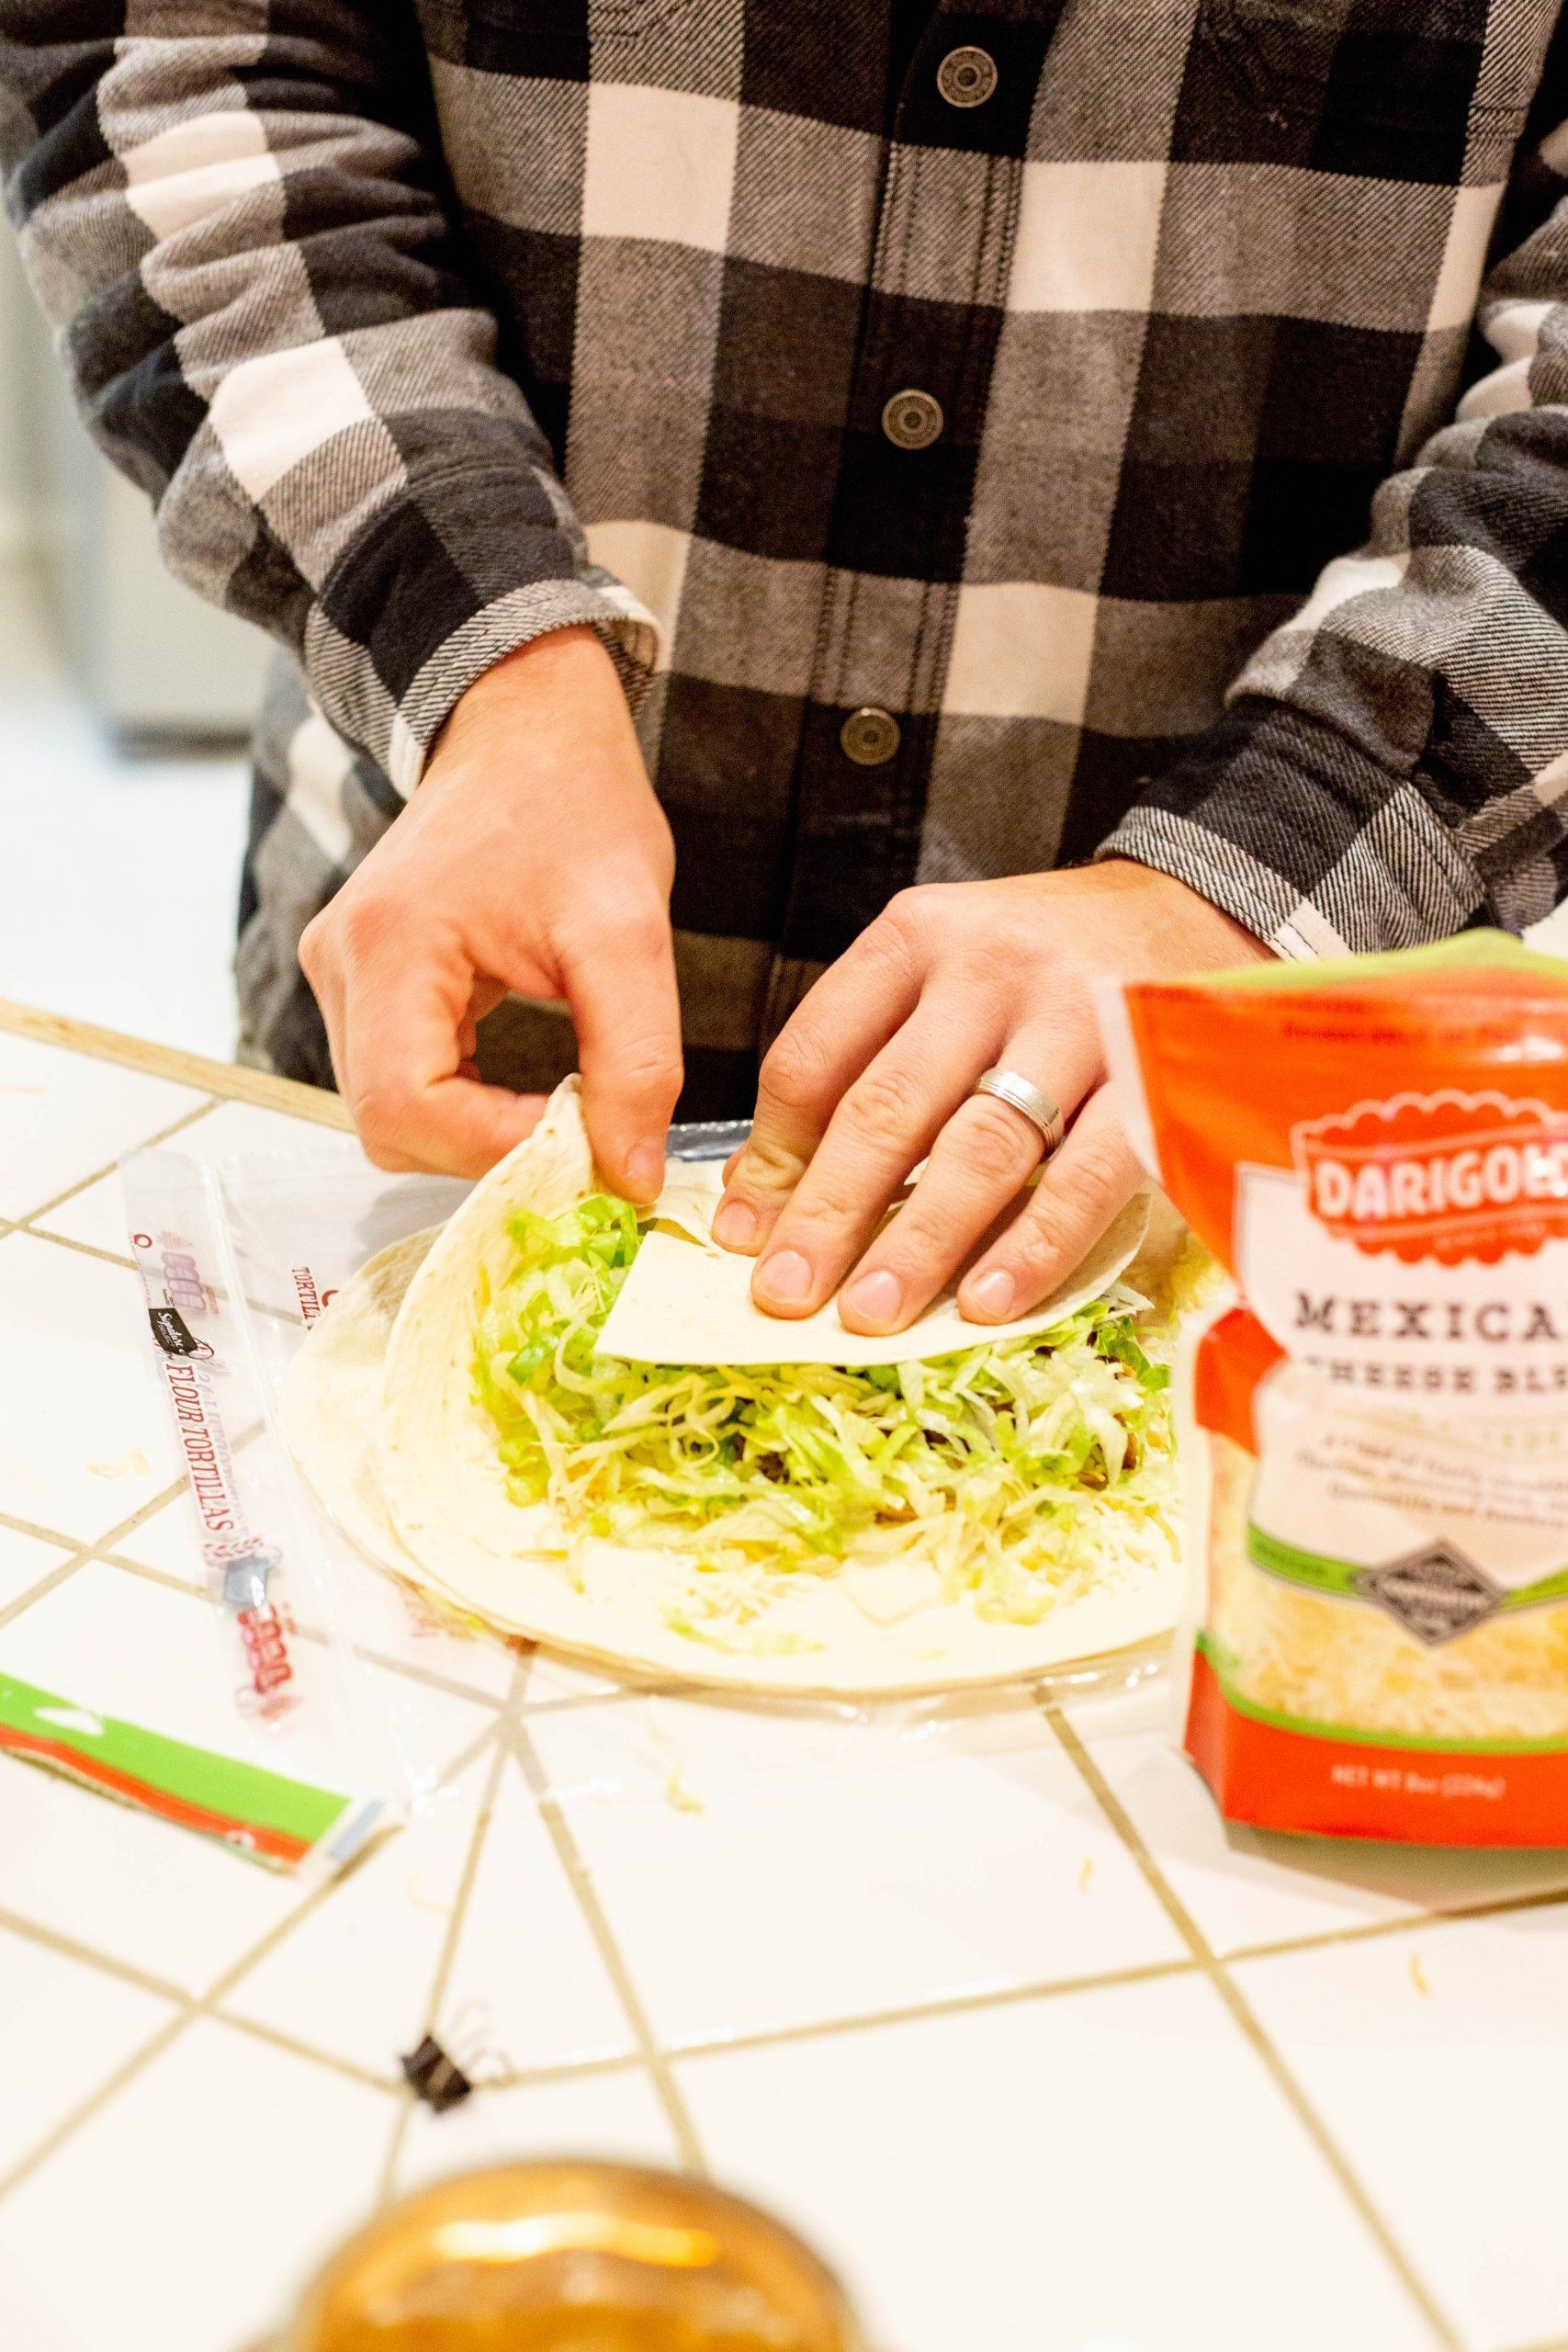 Copycat Homemade Taco Bell Crunchwrap Steak Crunchwrap In 2020 Homemade Tacos Easy Dinner Recipes Homemade Recipes